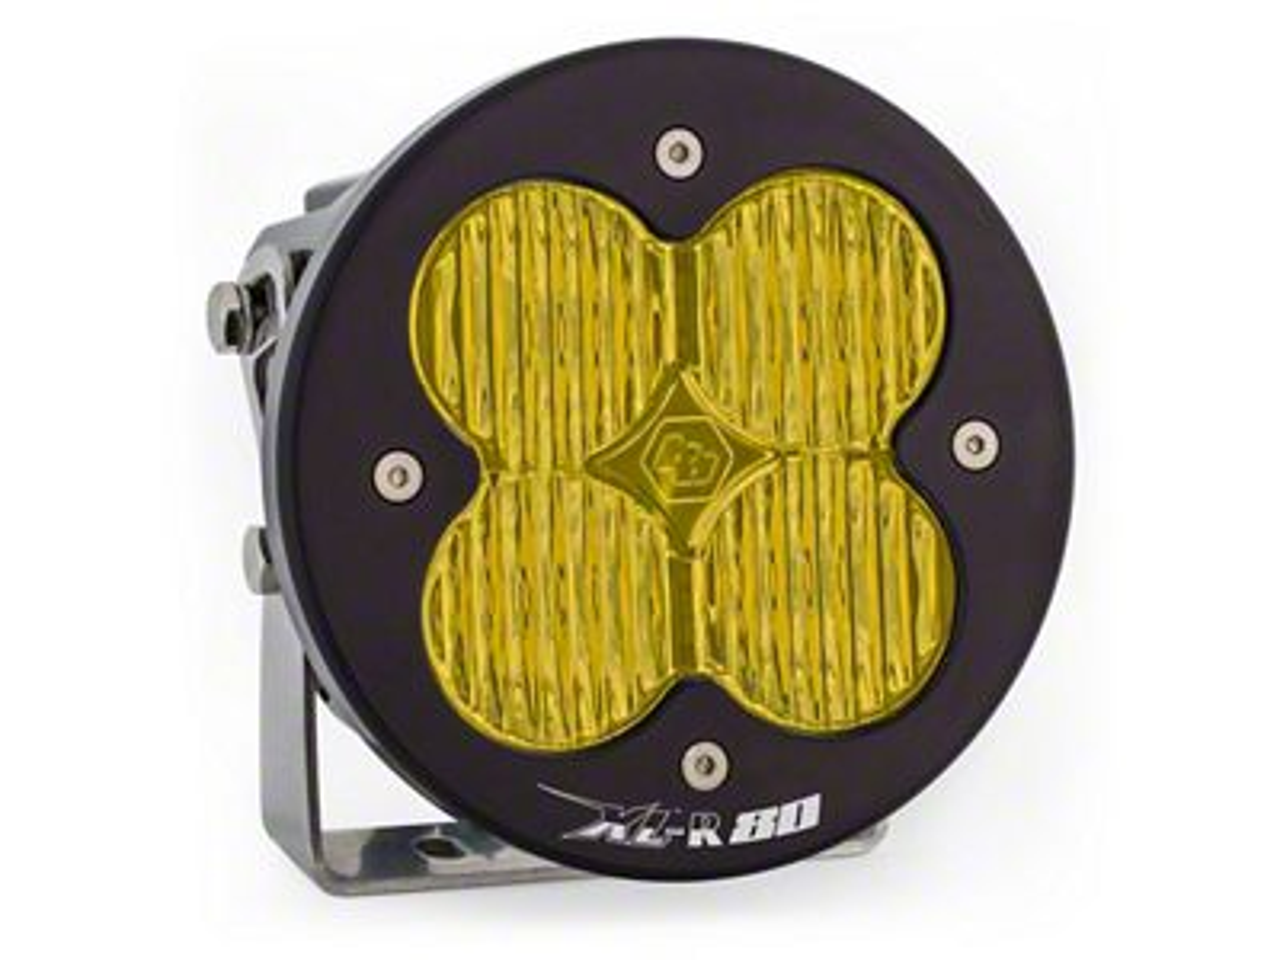 Baja Designs XL-R 80 Amber LED Light - Wide Cornering Beam